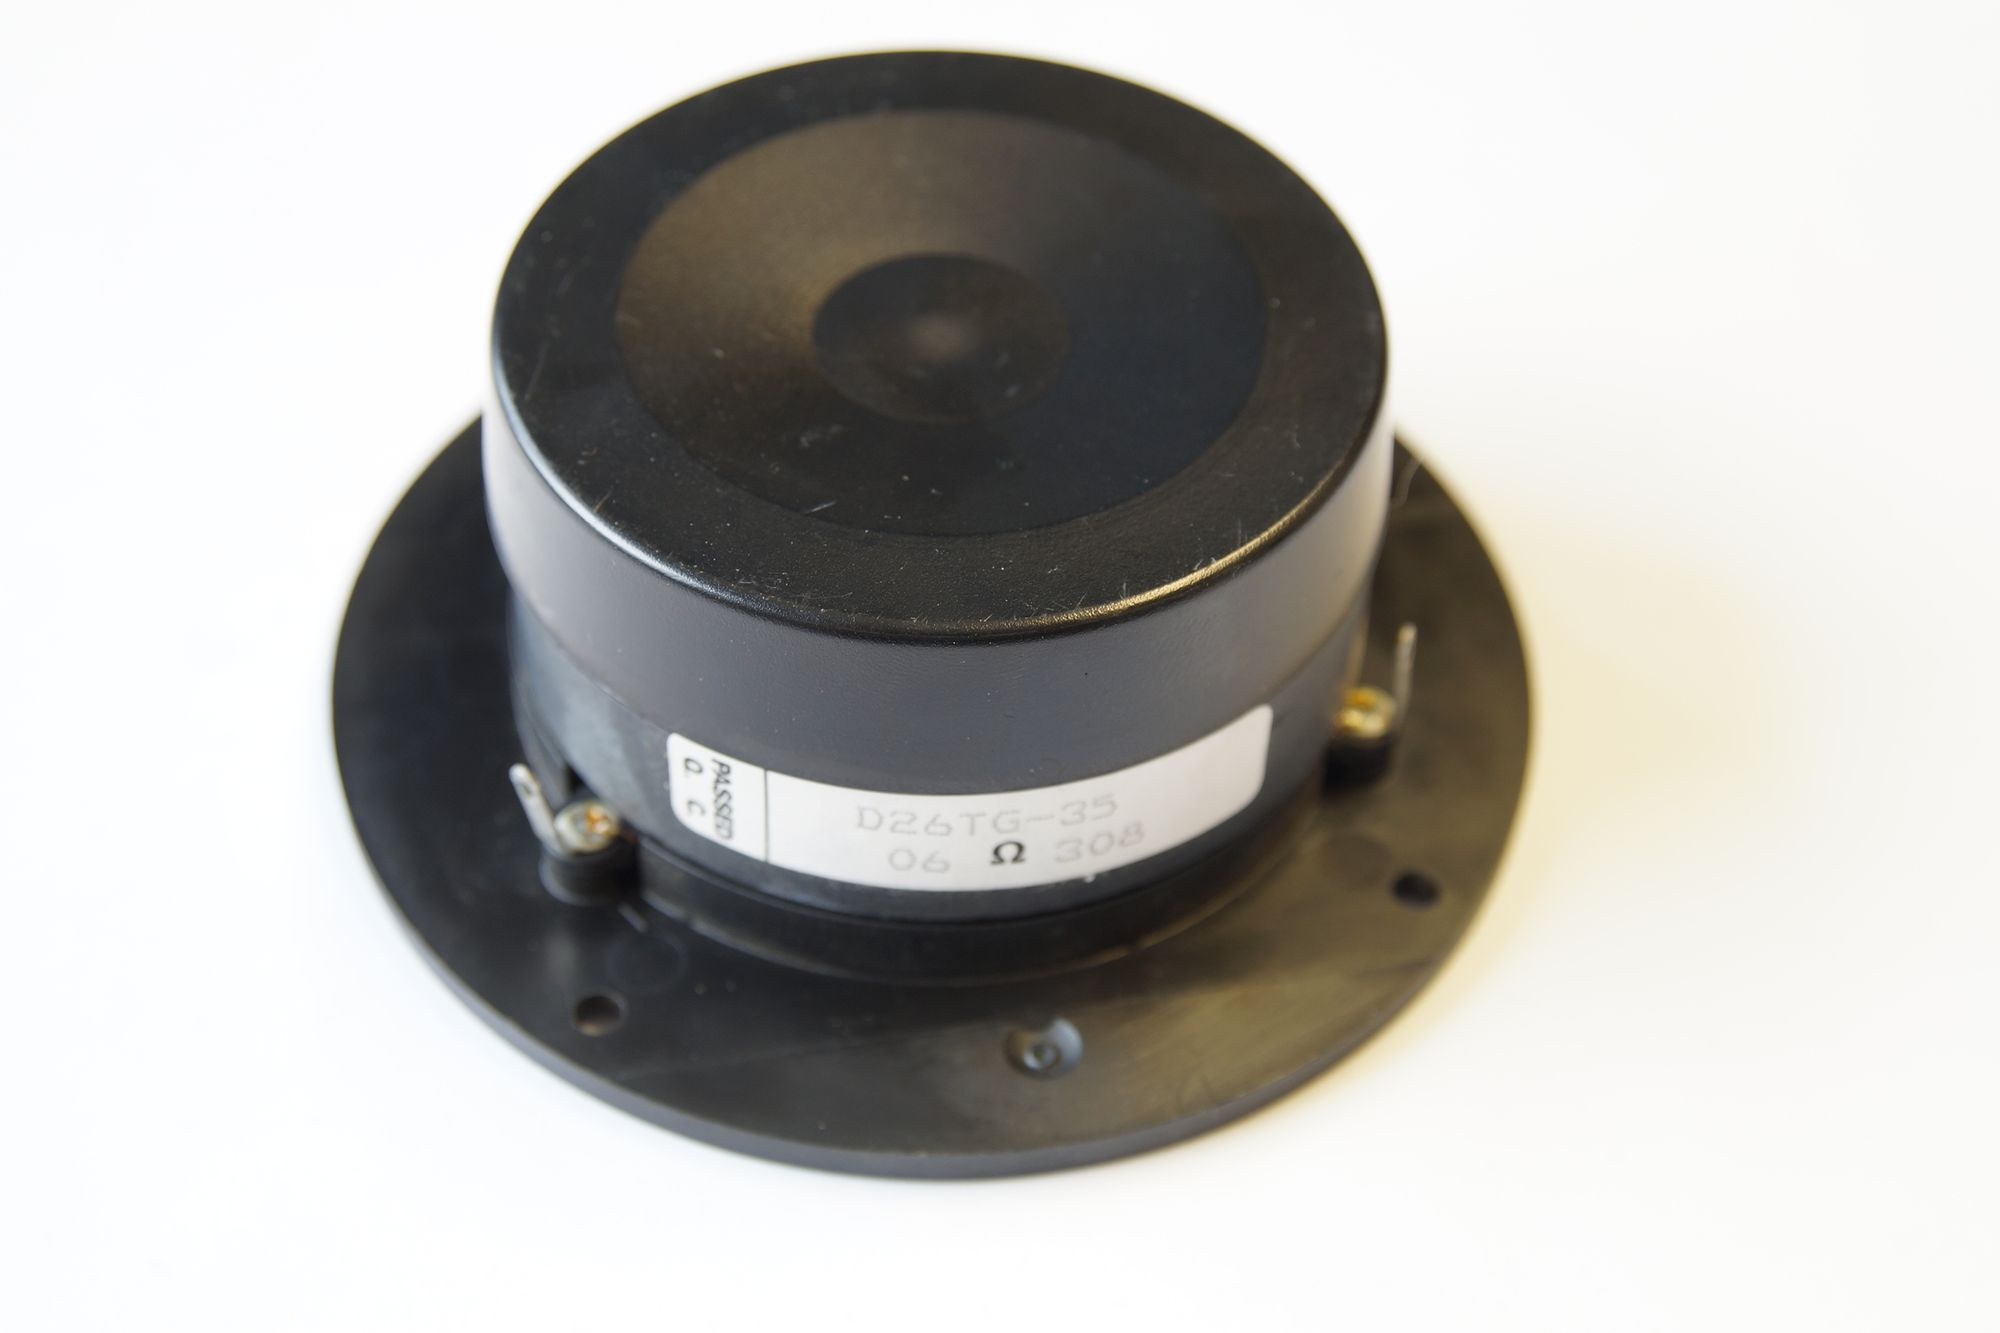 1 Stück Heco Hochtöner D 26 TG-35 Serviceware – Bild 2